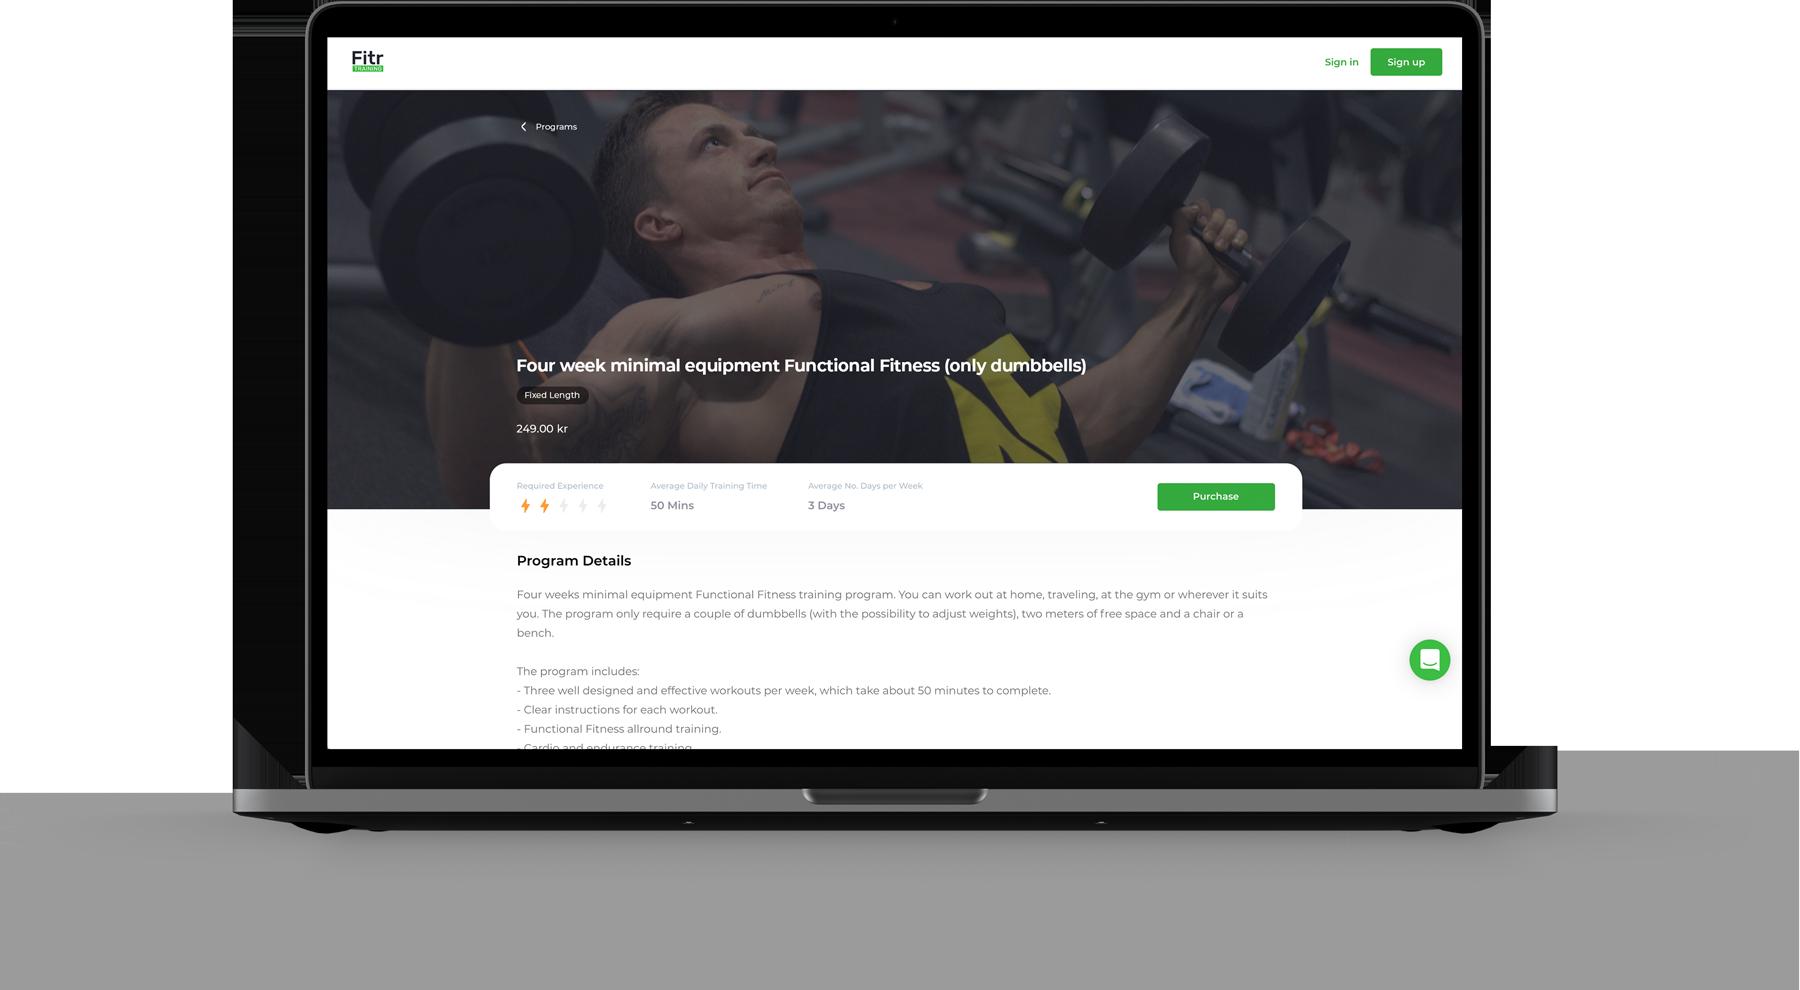 Program information page for online fitness software